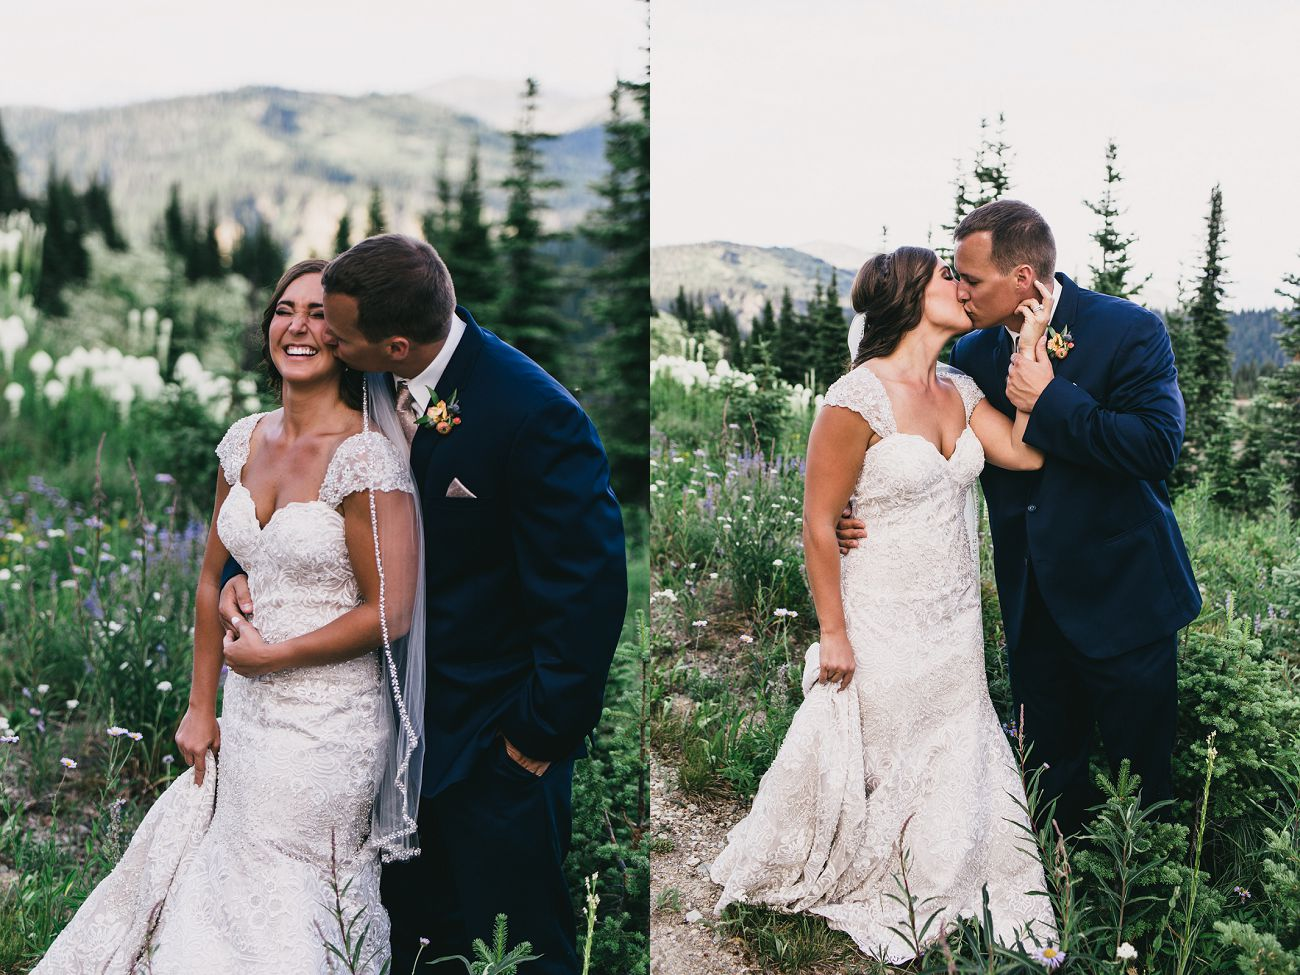 Jennifer_Mooney_Photo_Whitefish_Mountain_Resort_Wedding_00089.jpg